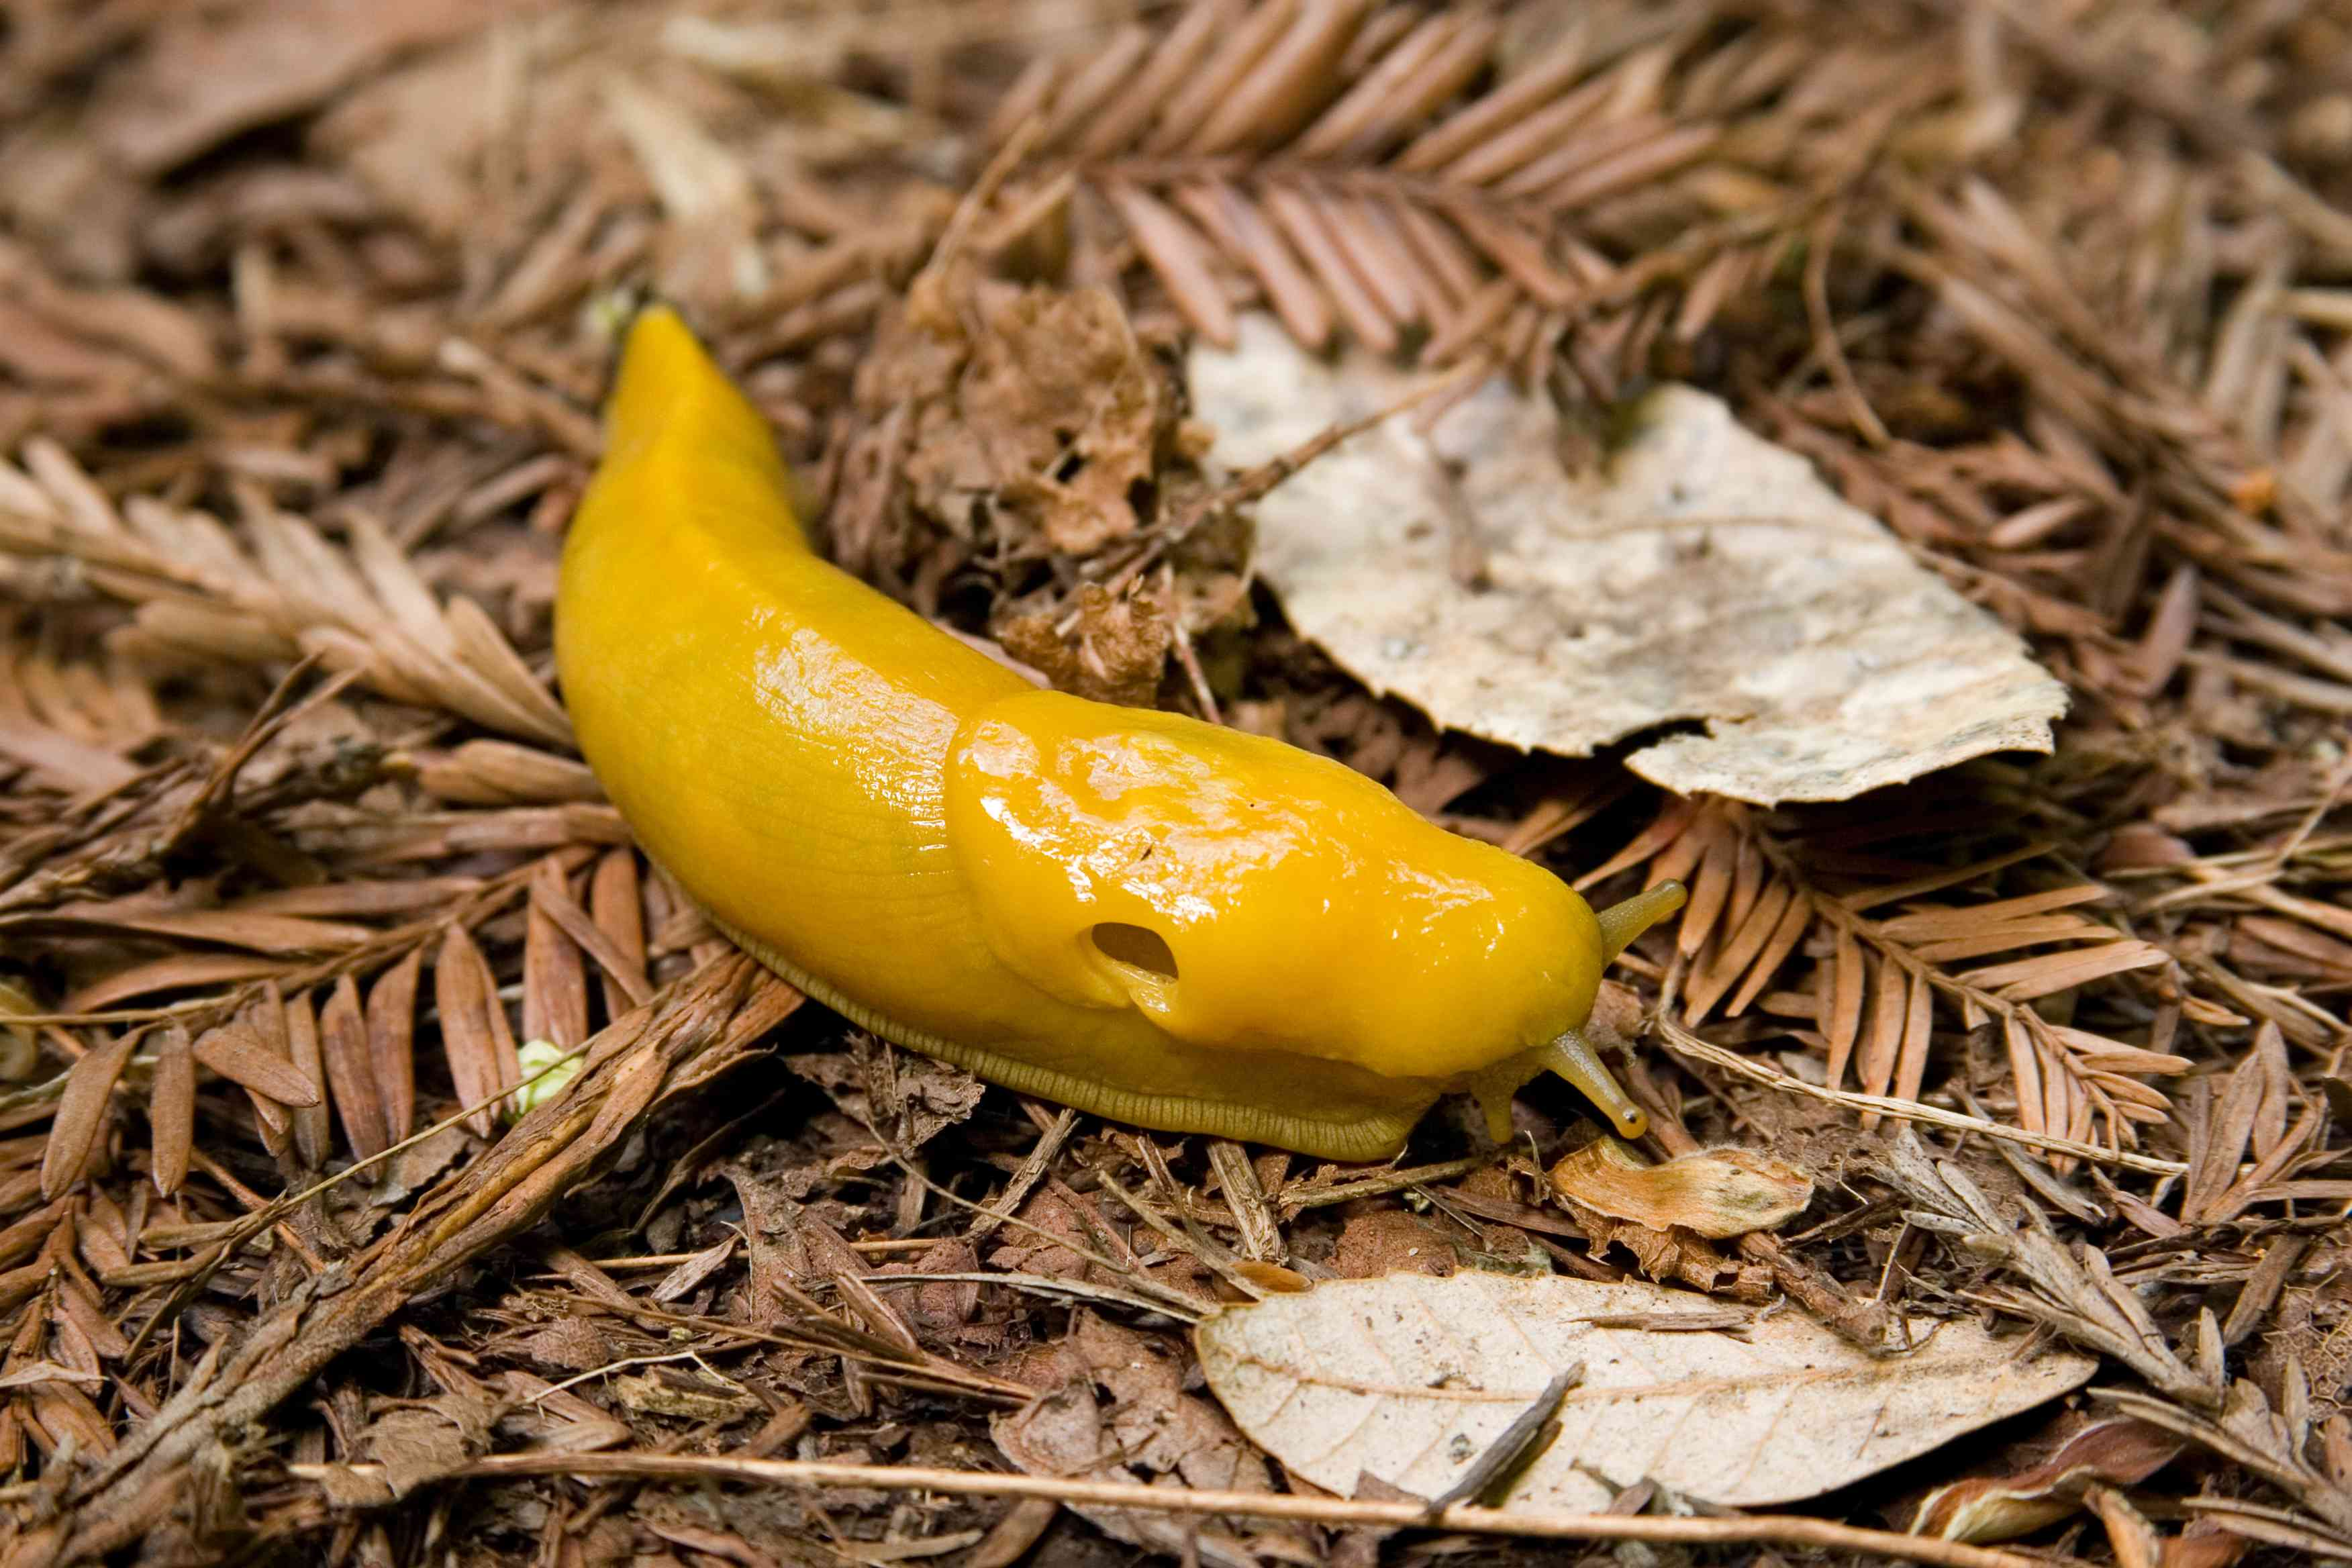 Santa Cruz Mountains Banana Slug with large visible hole on the side of head